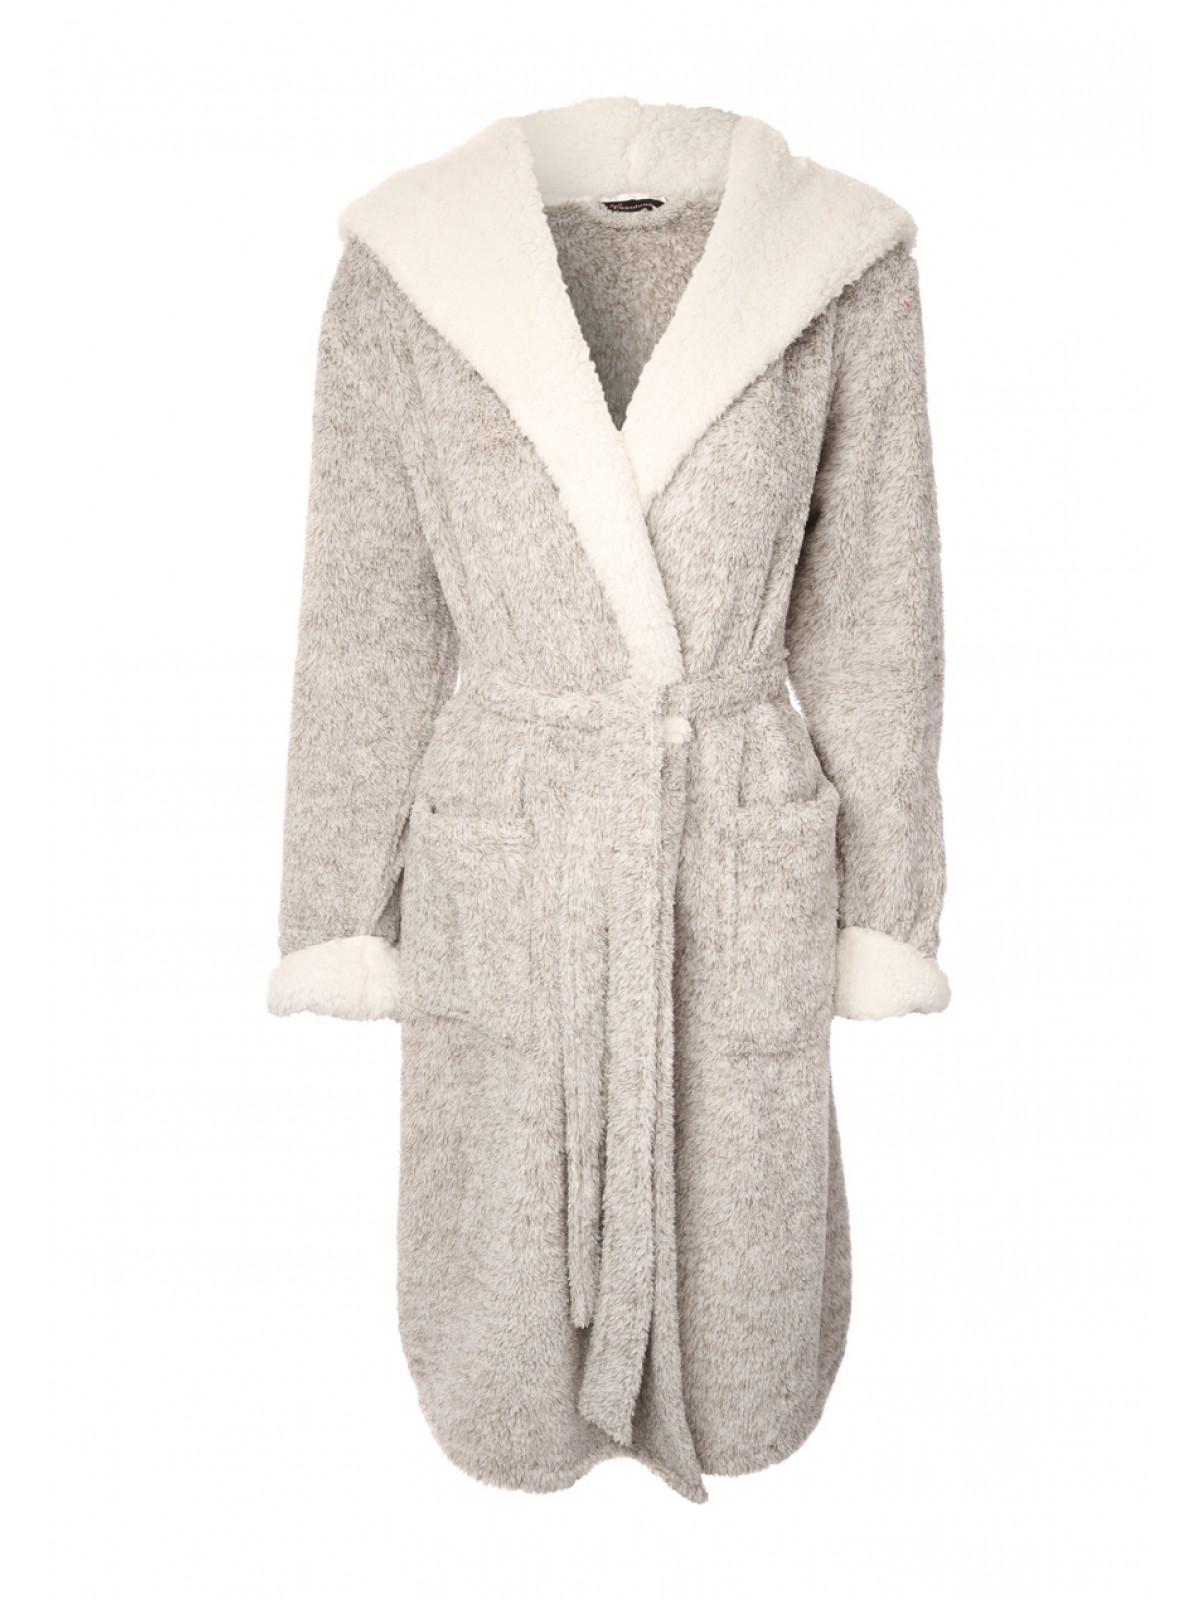 Fluffy Dressing Gown Long Dress Online Uk